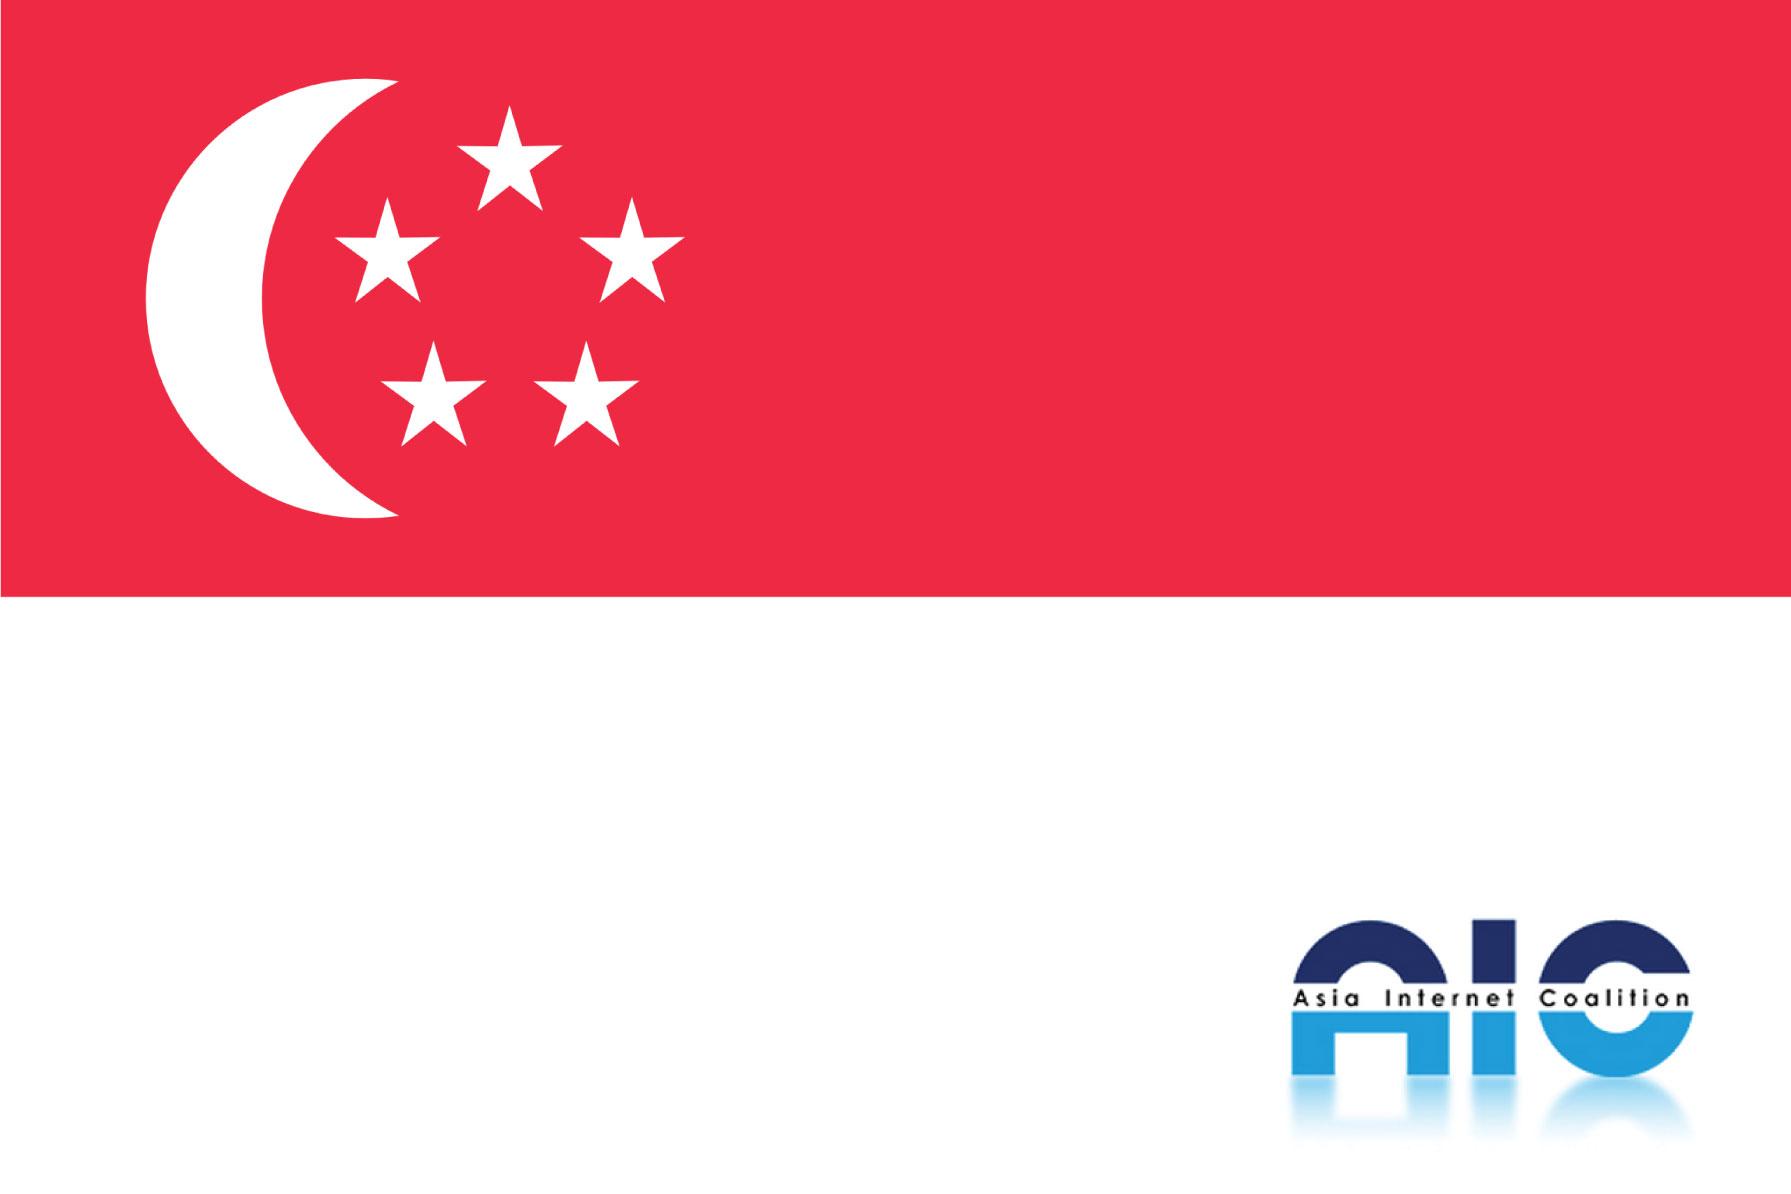 Singapur Internet